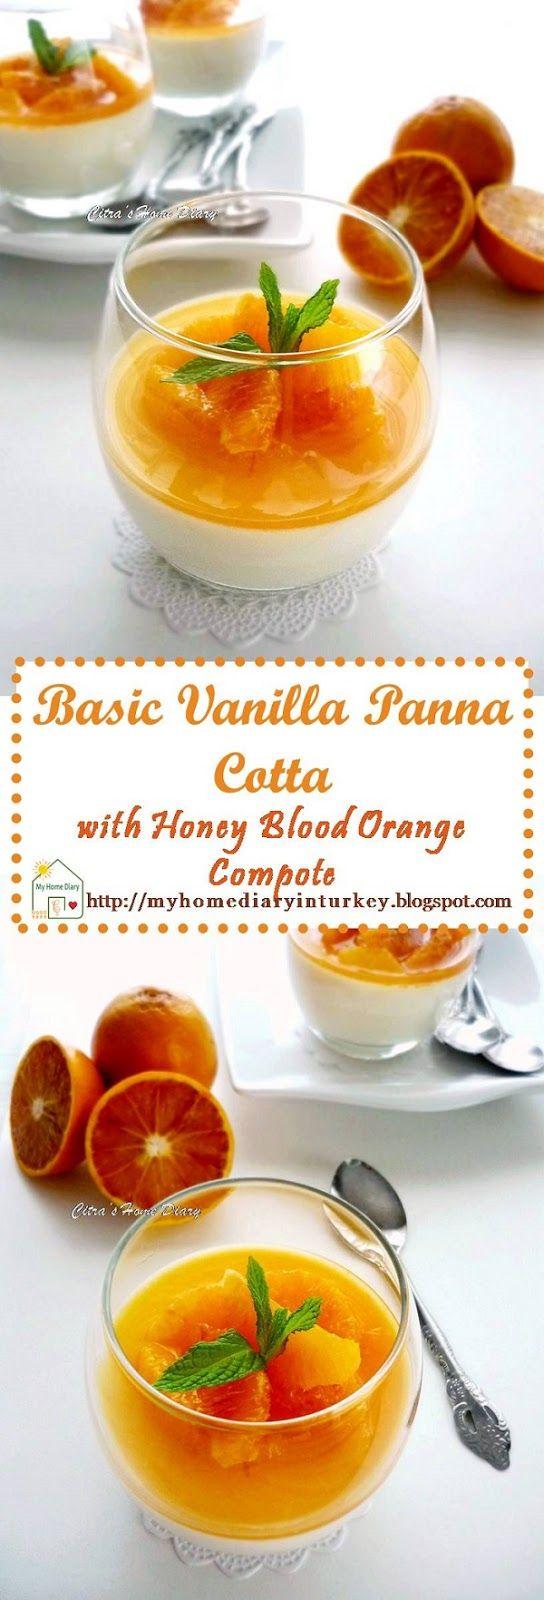 Basic Vanilla Panna Cotta with Honey Blood Orange Compote. so refreshing and delish panna cotta with honey blood orange compote. #bloodorange #orangerecipe #pannacotta #dessert #pudding #orangecompote #spring